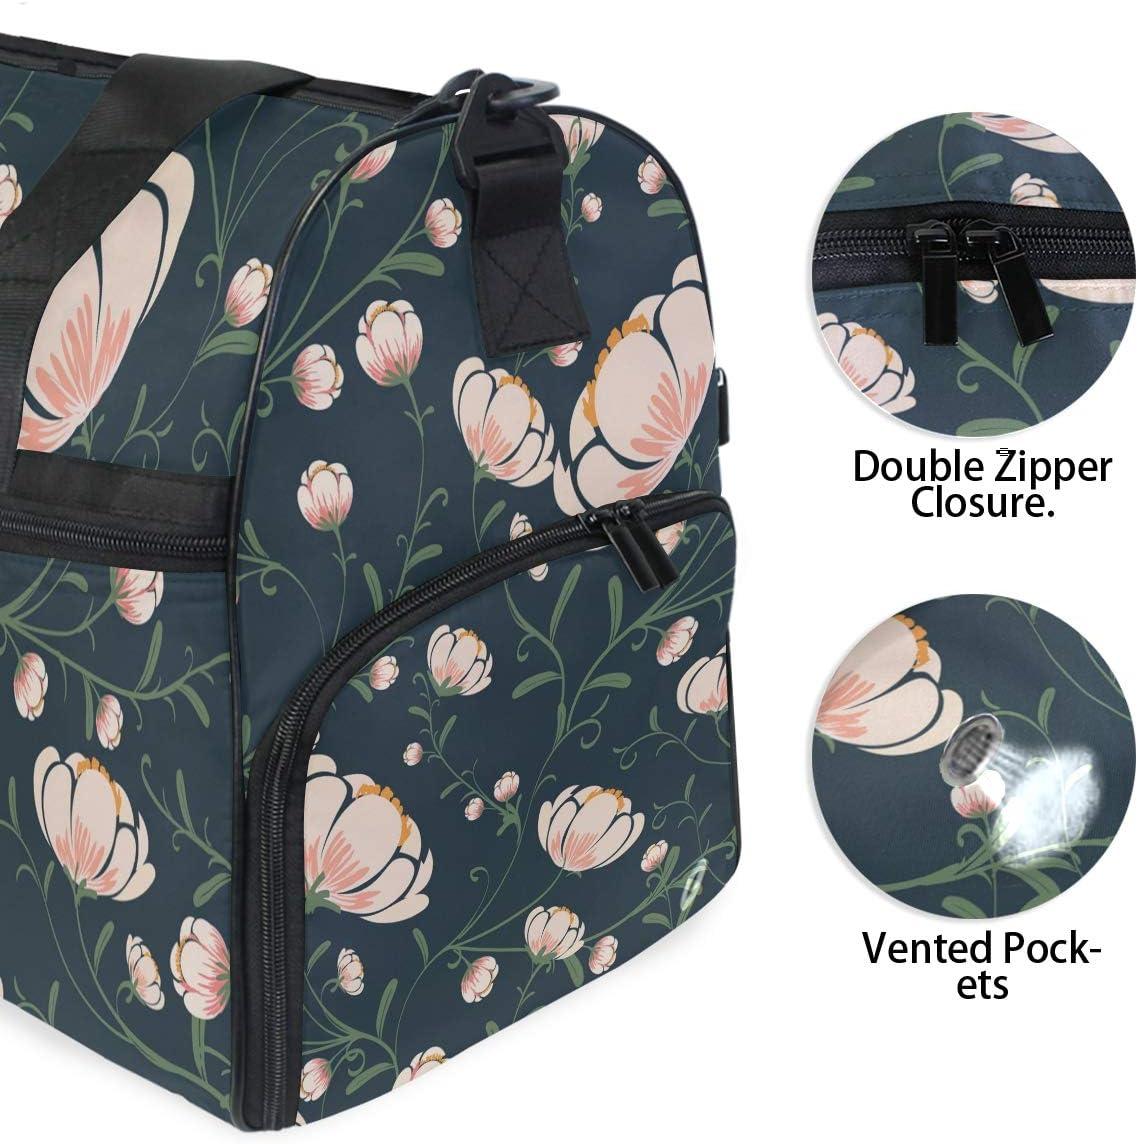 Travel Duffels Flowers Pattern Duffle Bag Luggage Sports Gym for Women /& Men